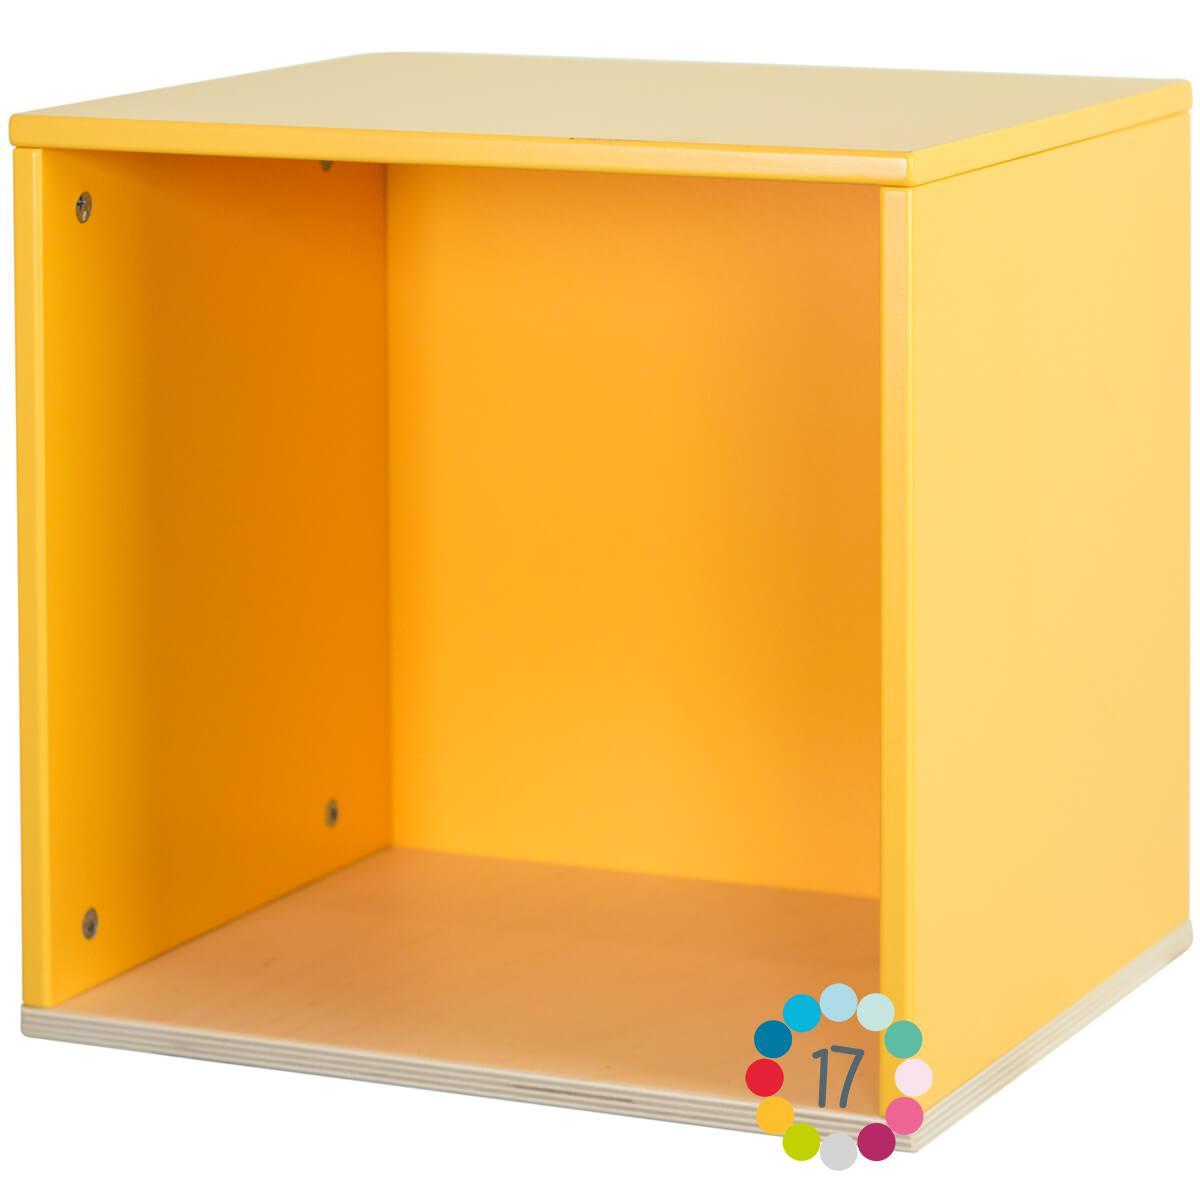 Cube mural COLORFLEX nectar yellow